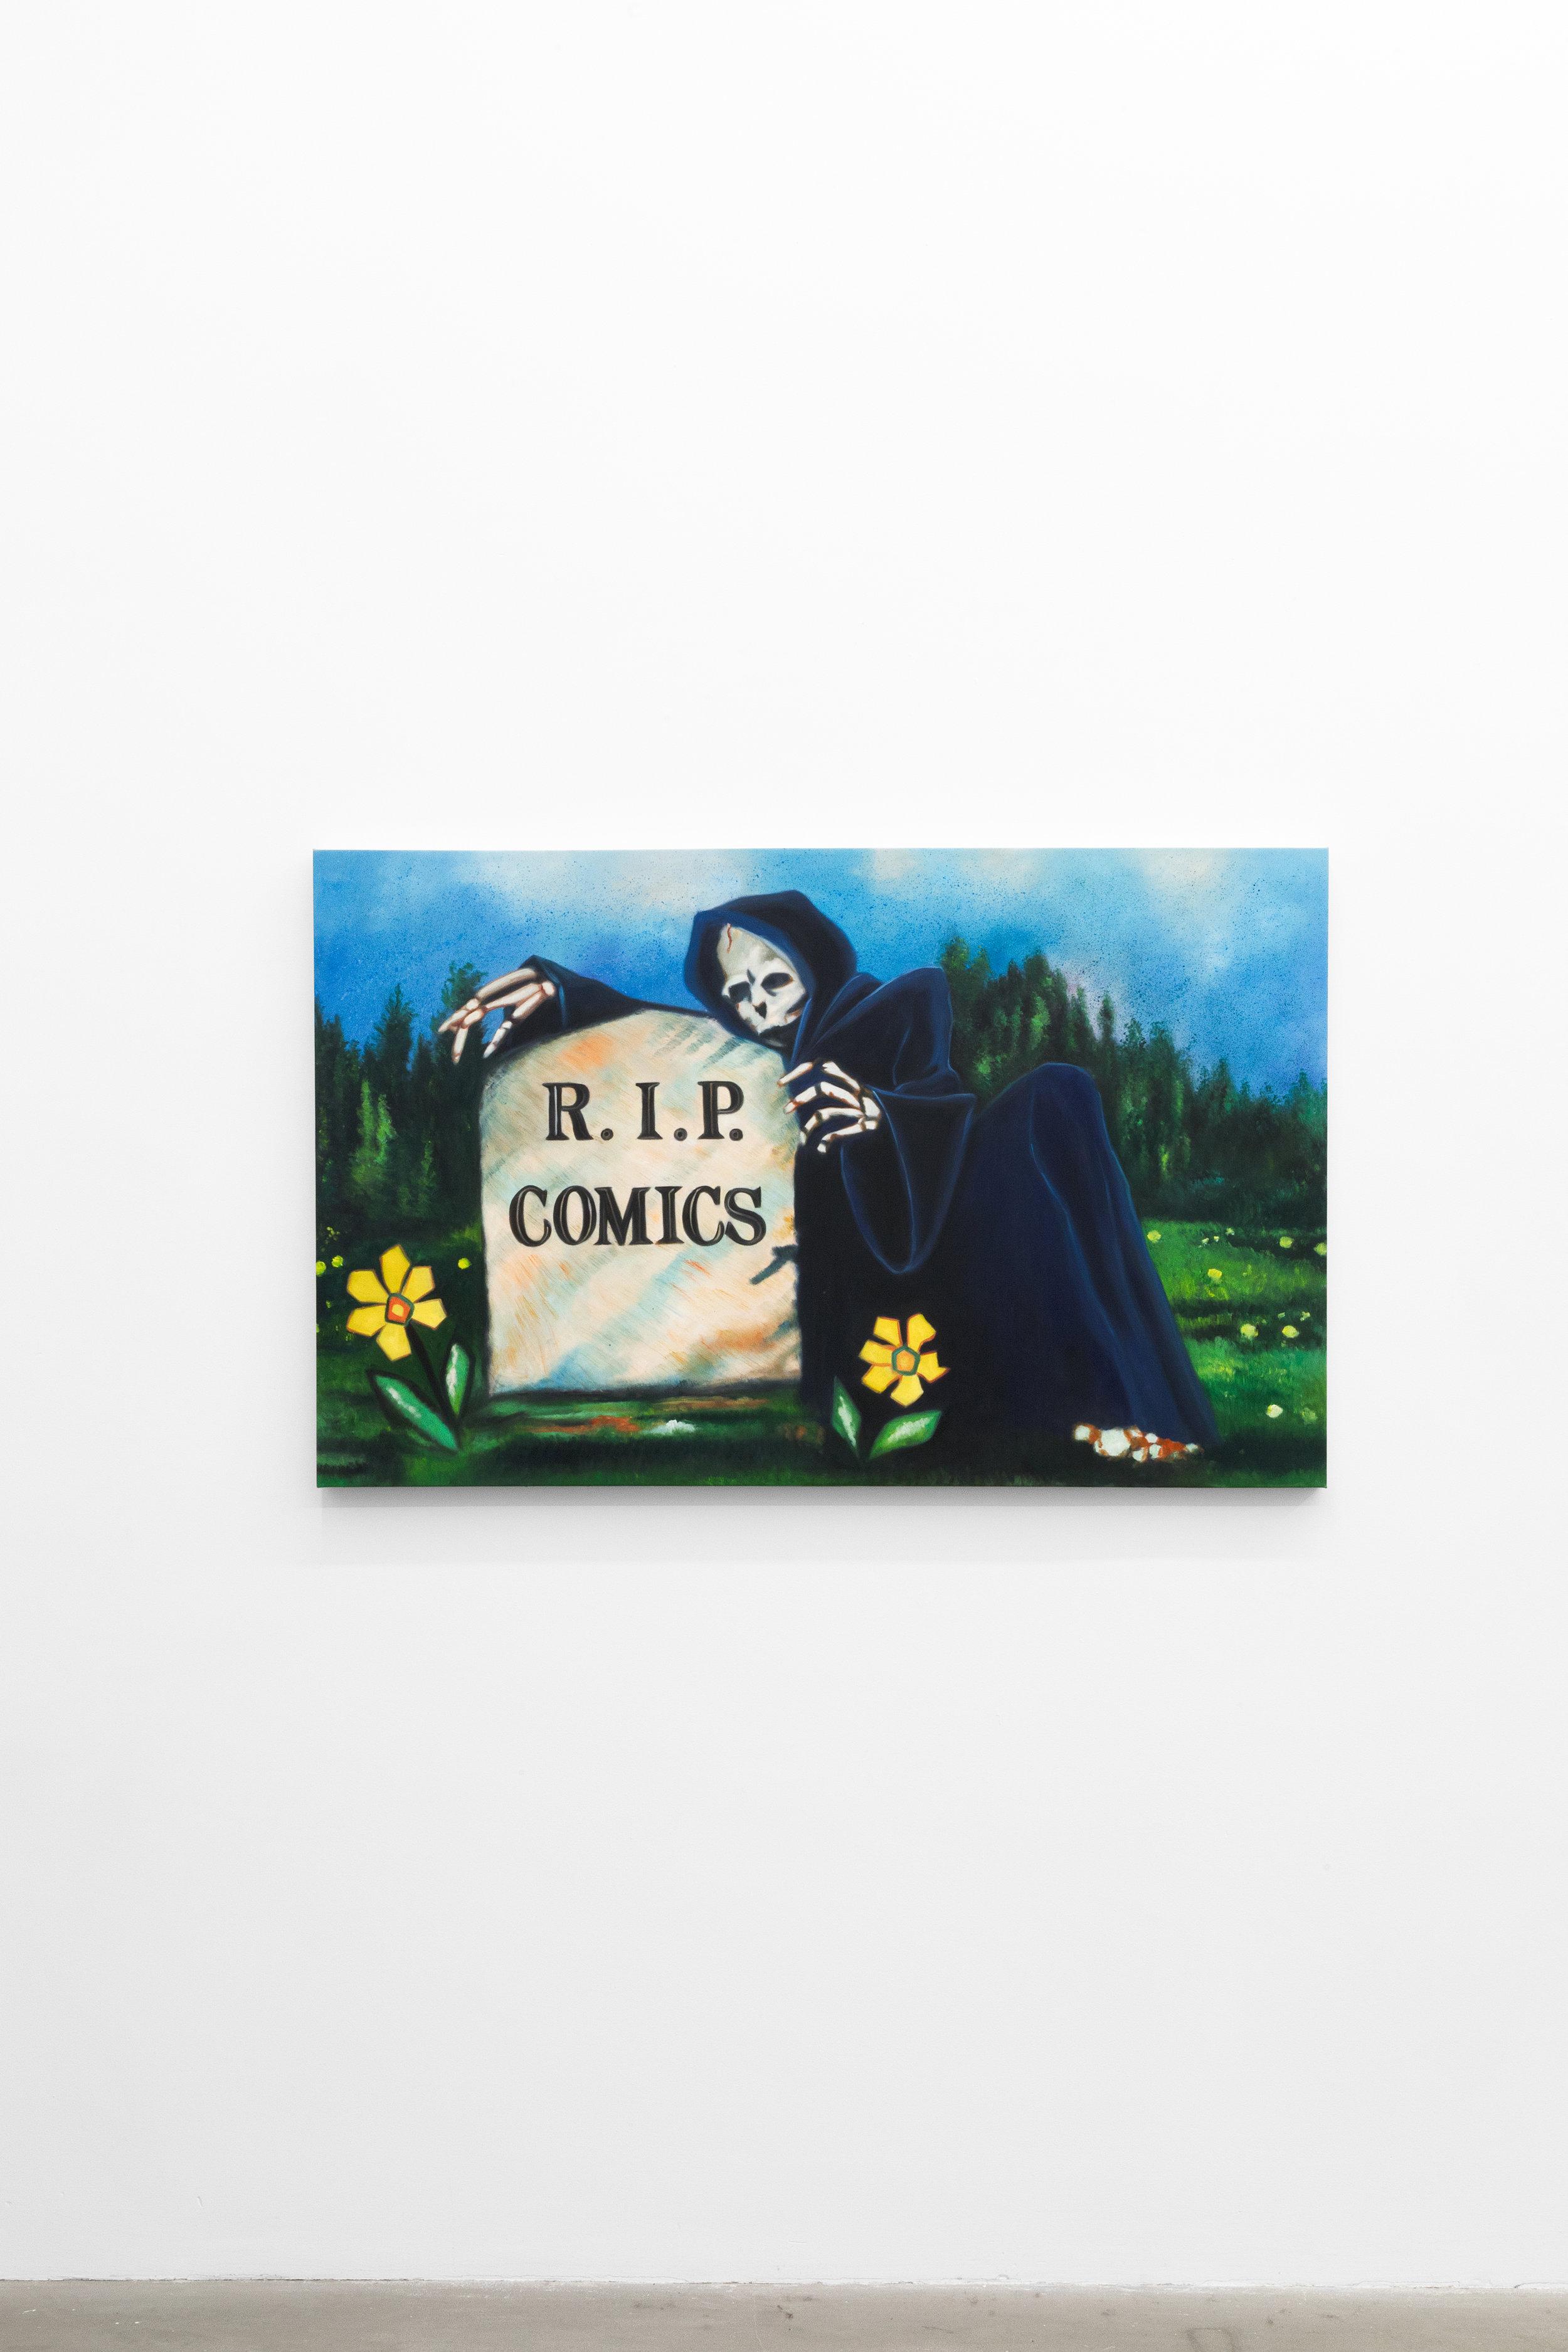 Jesse Harris,  Comics , 2018, Oil on canvas, 30 x 40 in (76.2 x 101.6 cm)